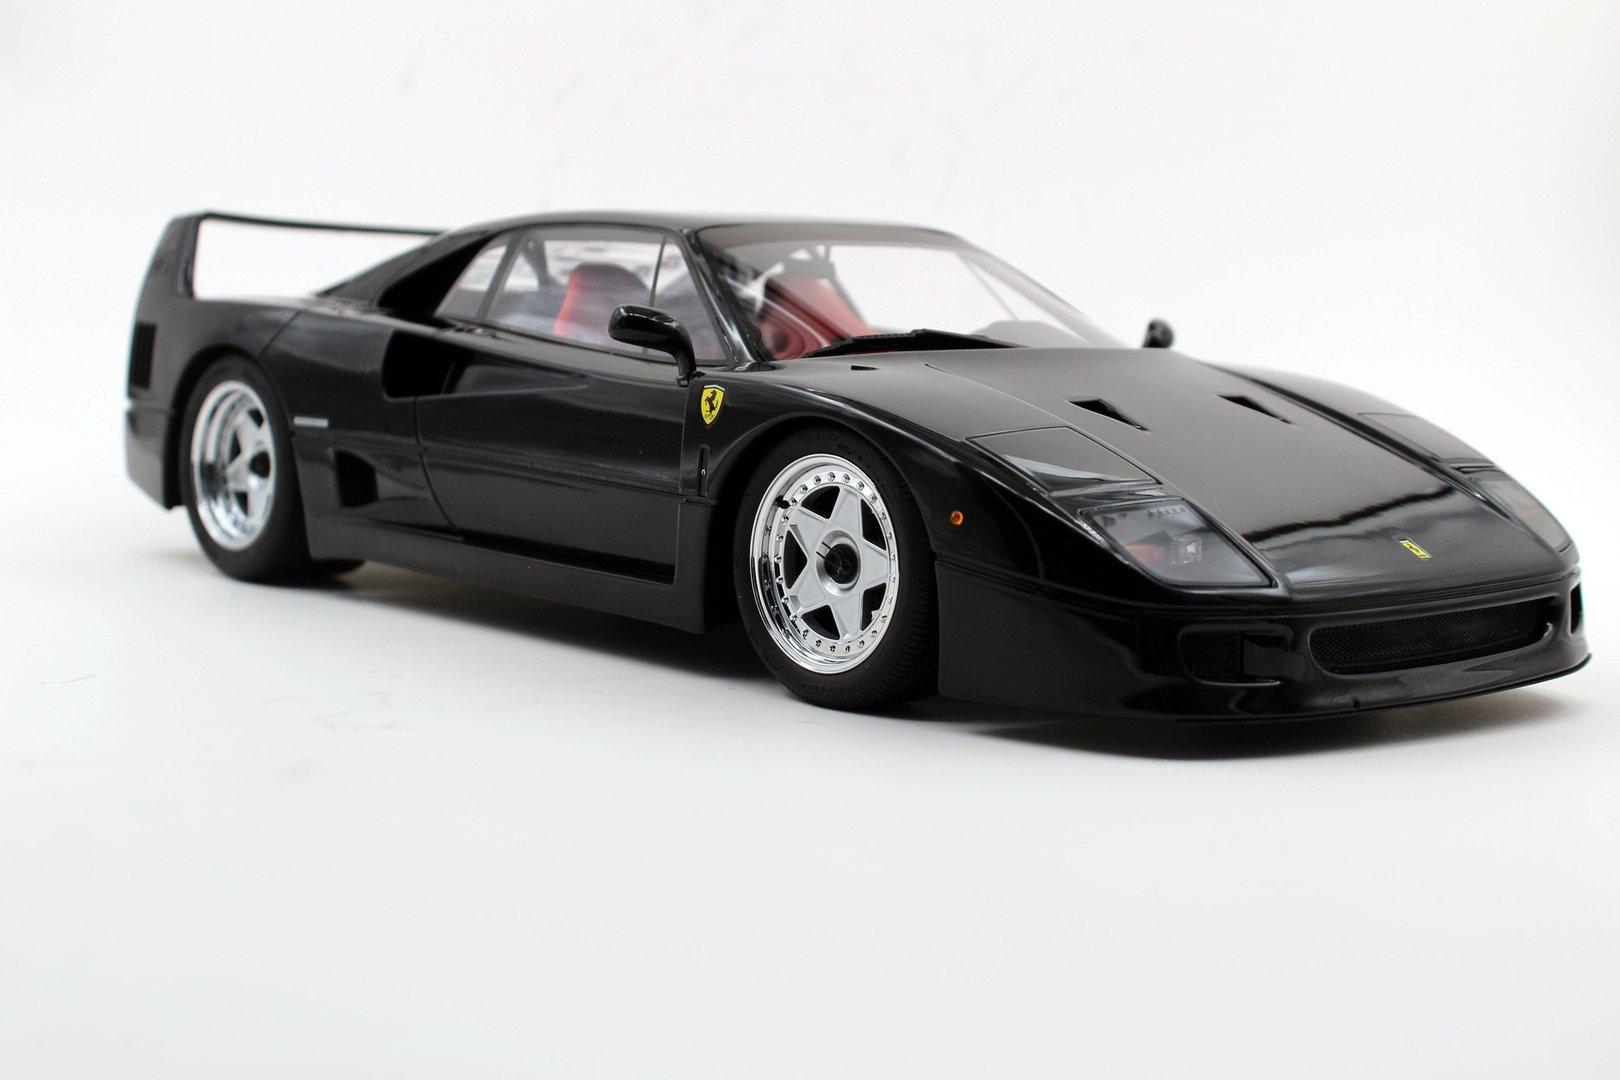 Ferrari F40 1987 Black Modellauto